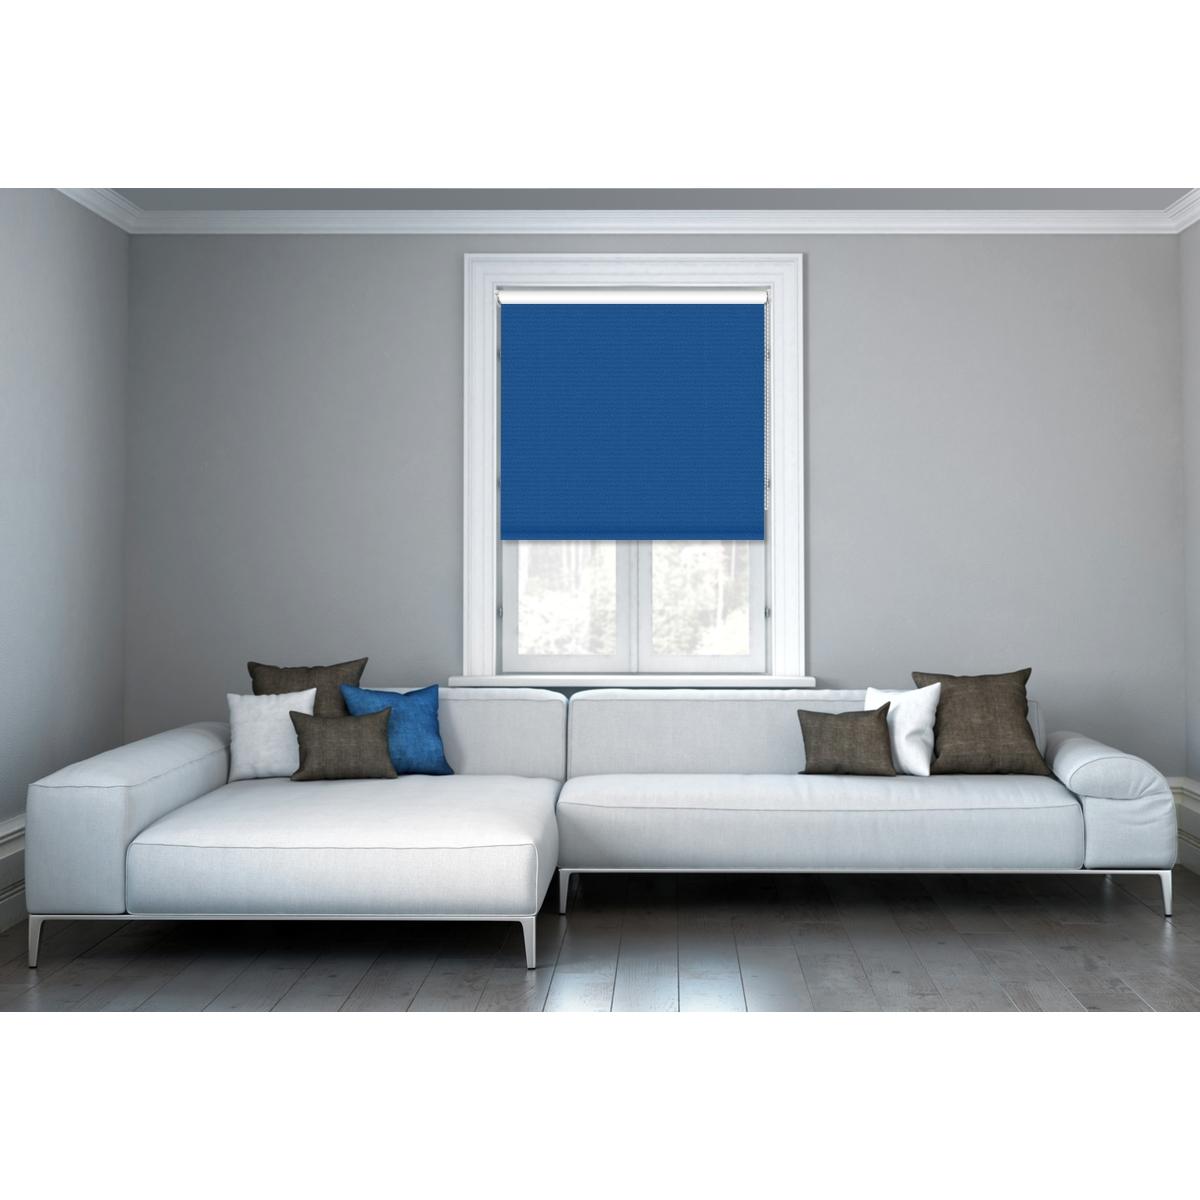 verdunkelungsrollo seitenzugrollo doppelrollo duo plissee jalousie klemmrollo ebay. Black Bedroom Furniture Sets. Home Design Ideas